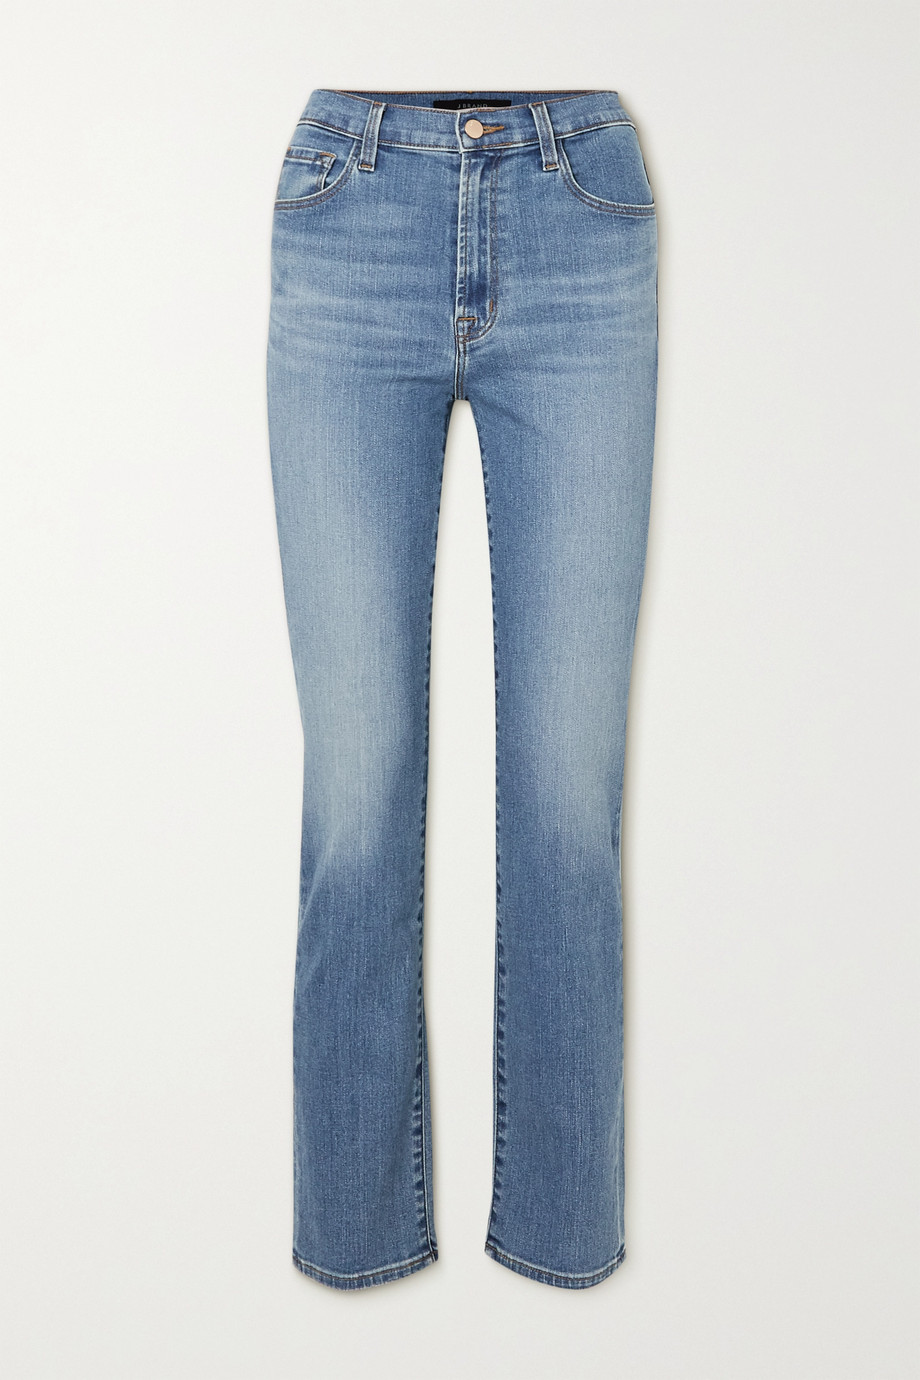 J Brand Jean droit taille haute Teagan